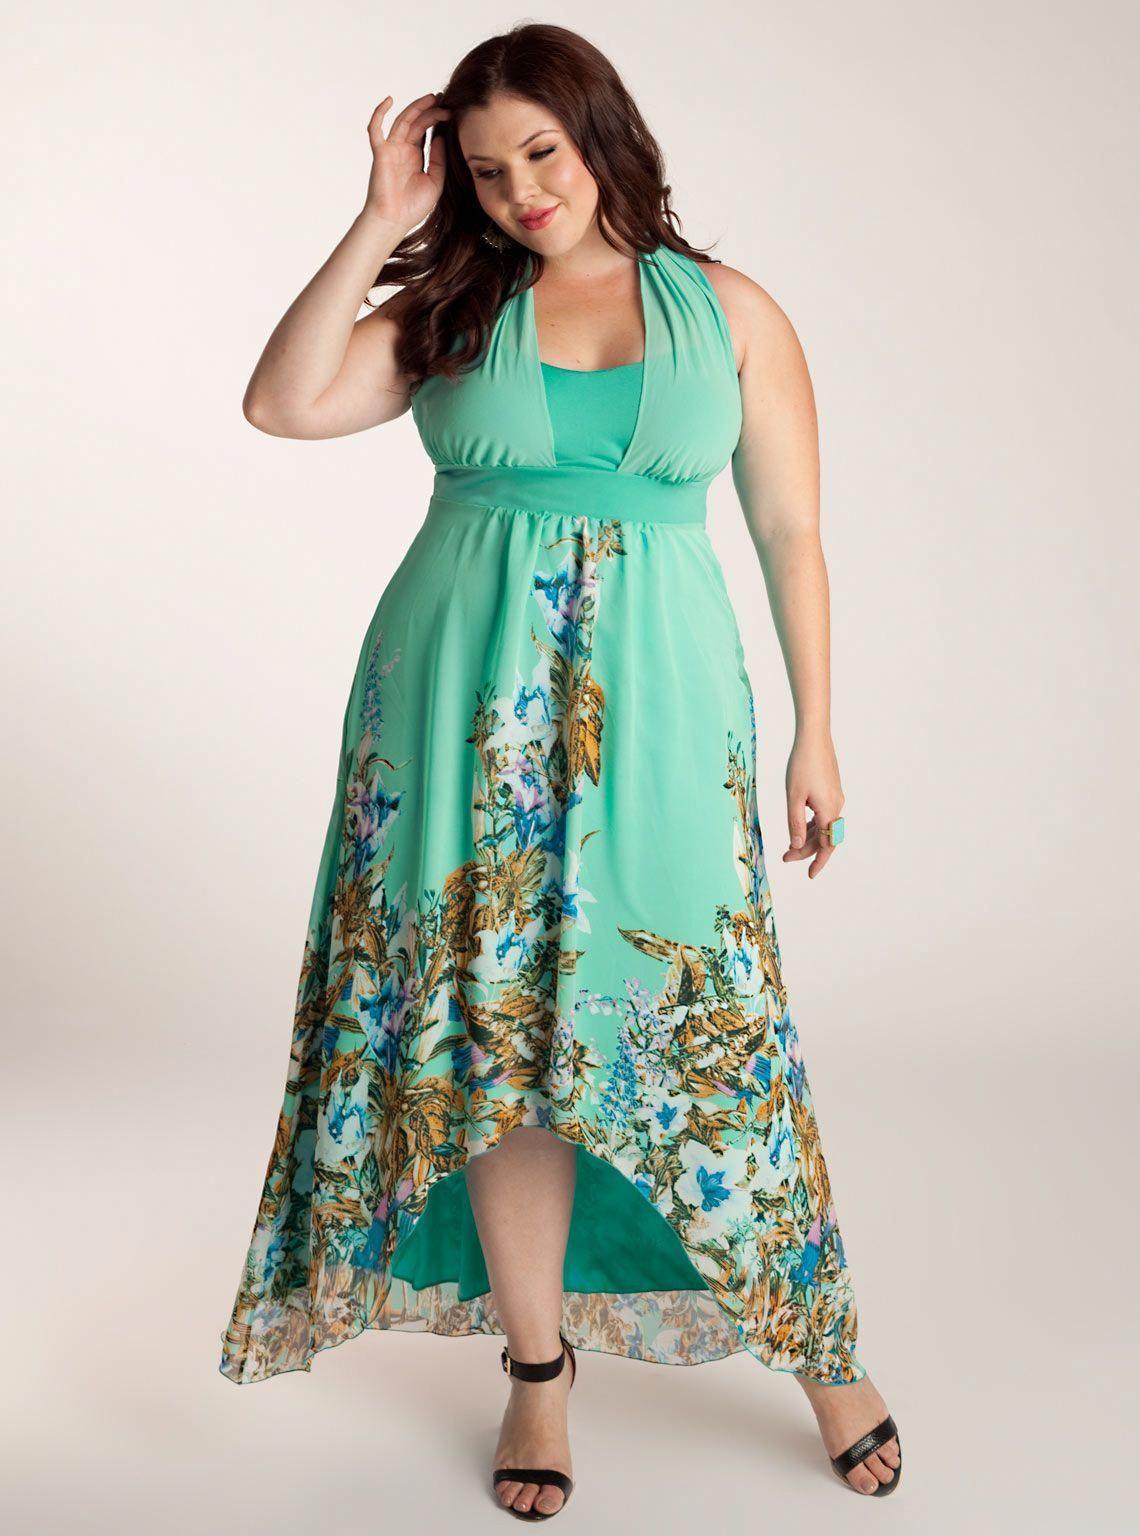 WomenFashionQuotes Women Fashion Quotes Pinterest Dresses